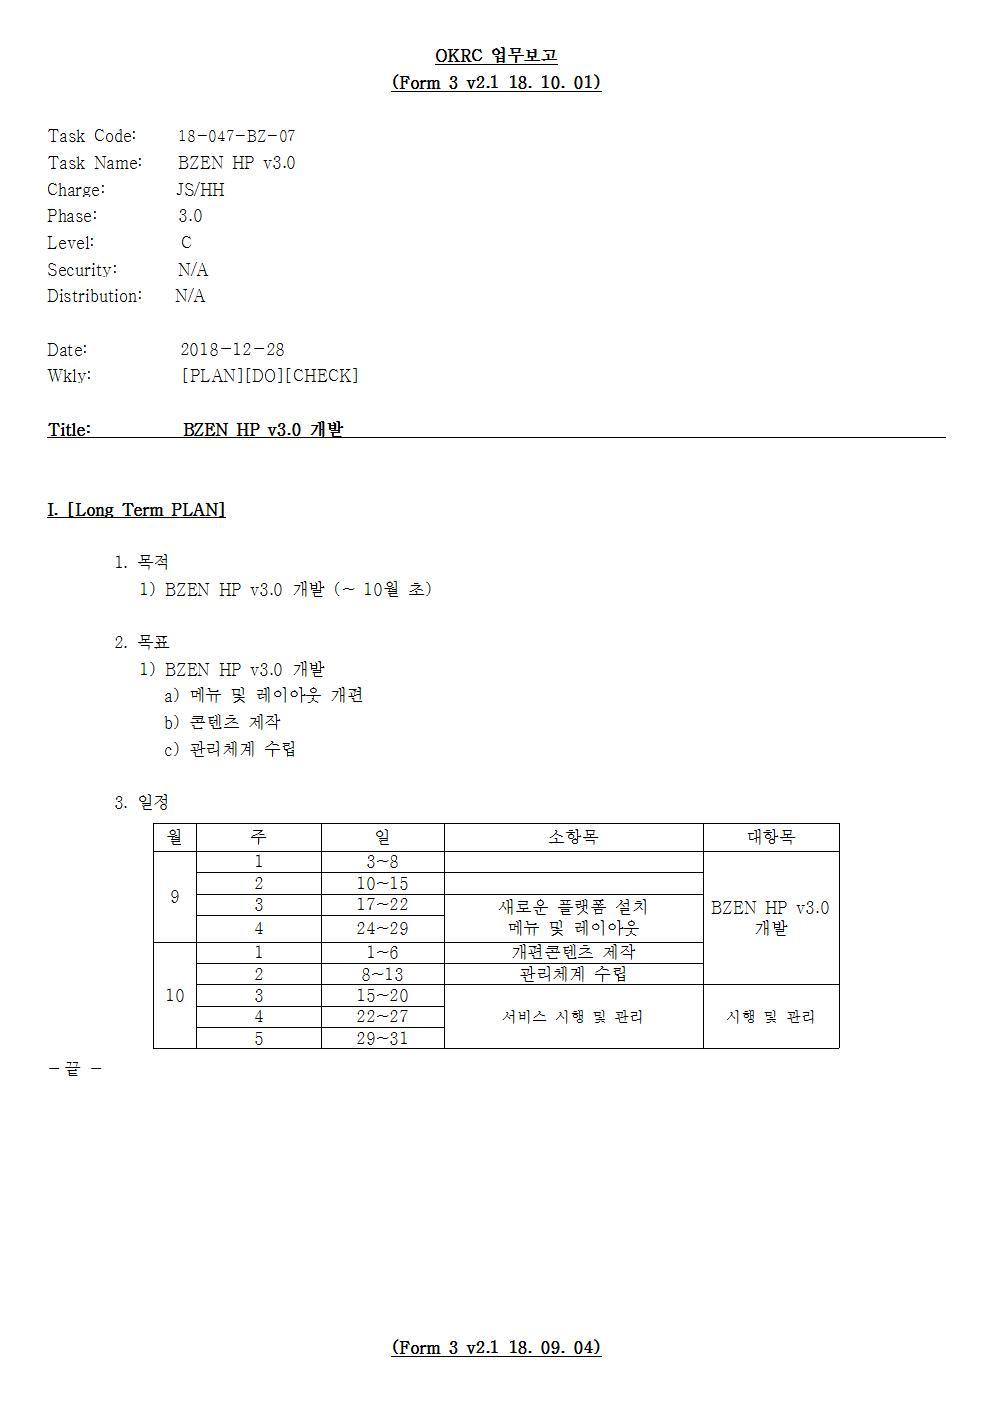 D-[18-047-BZ-07]-[BZEN HP v3.0]-[2018-12-27][HH]001.jpg